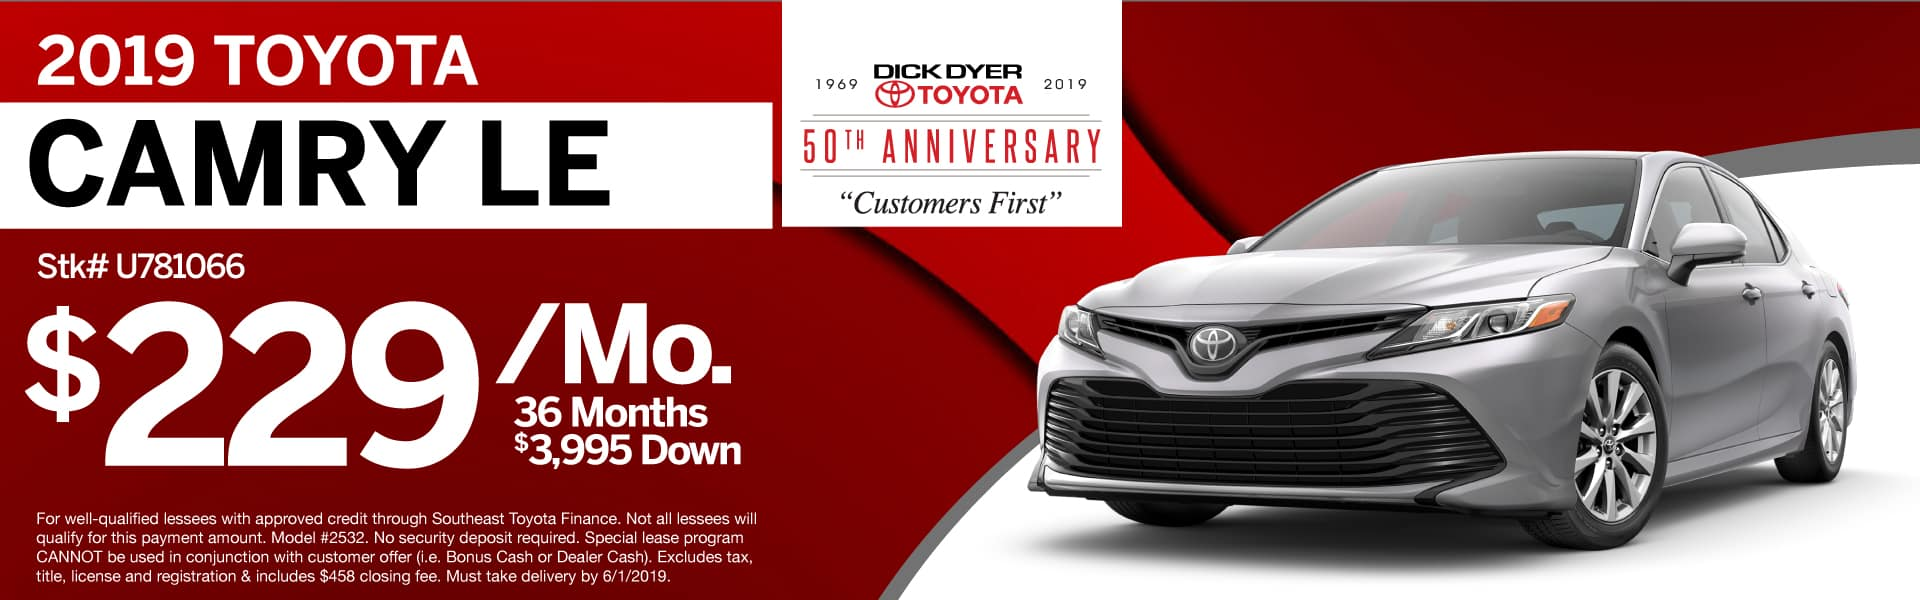 2019 Toyota Camry Sale